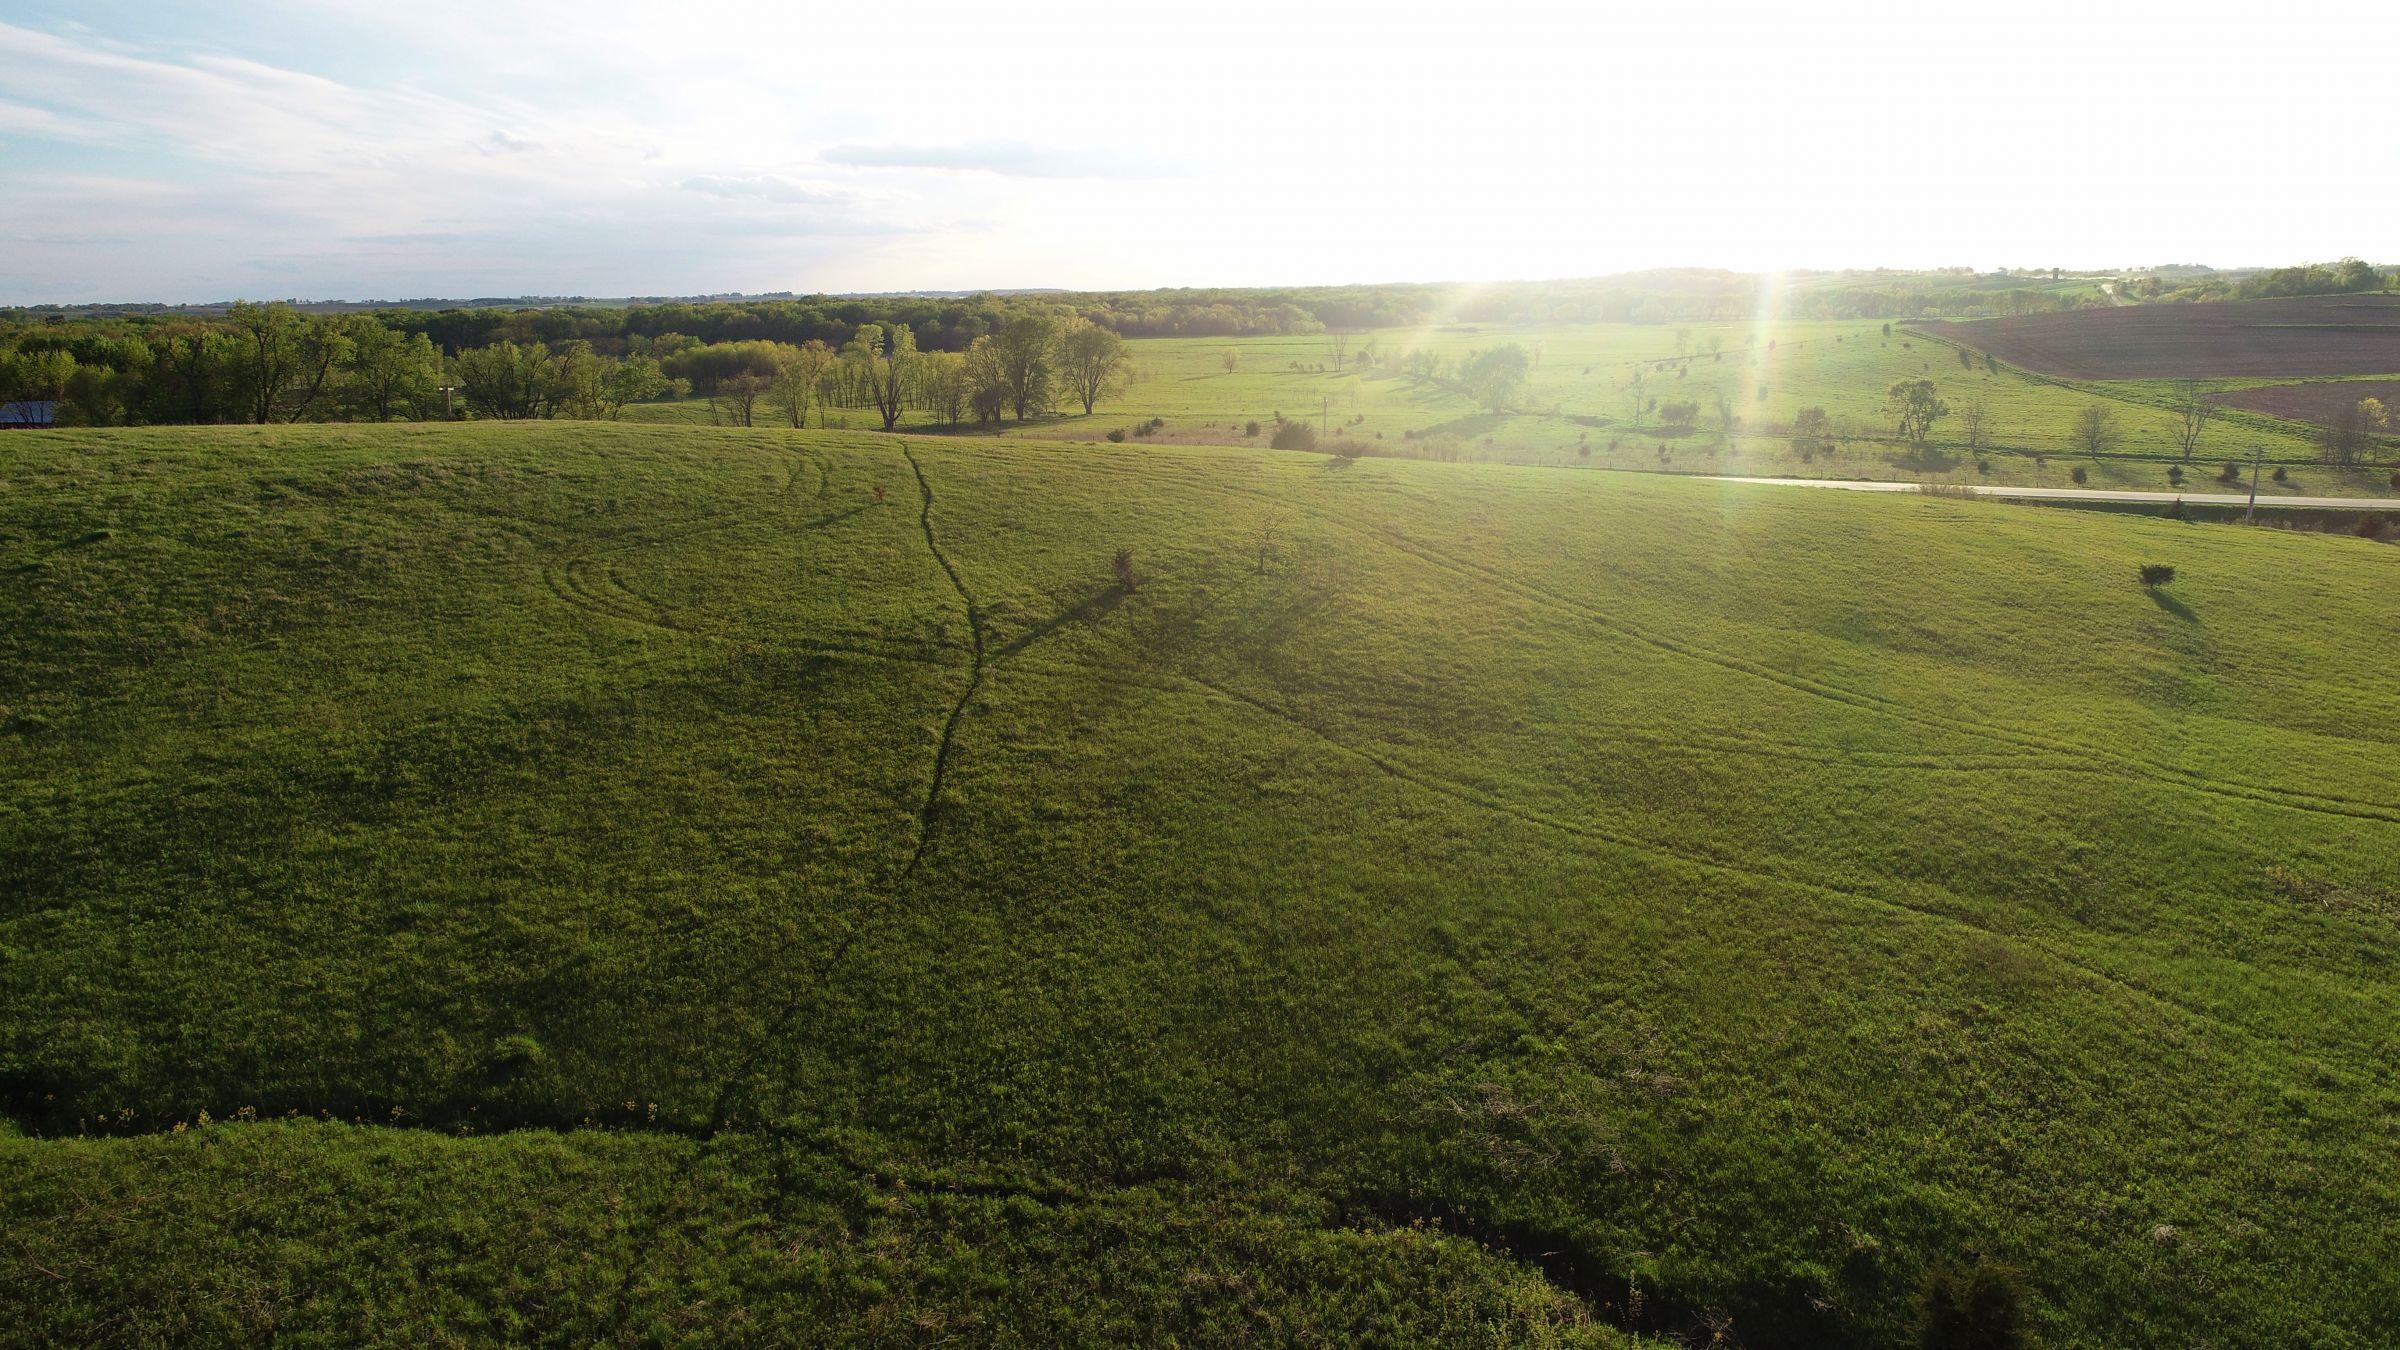 Washington County Iowa Land For Sale 12.jpg